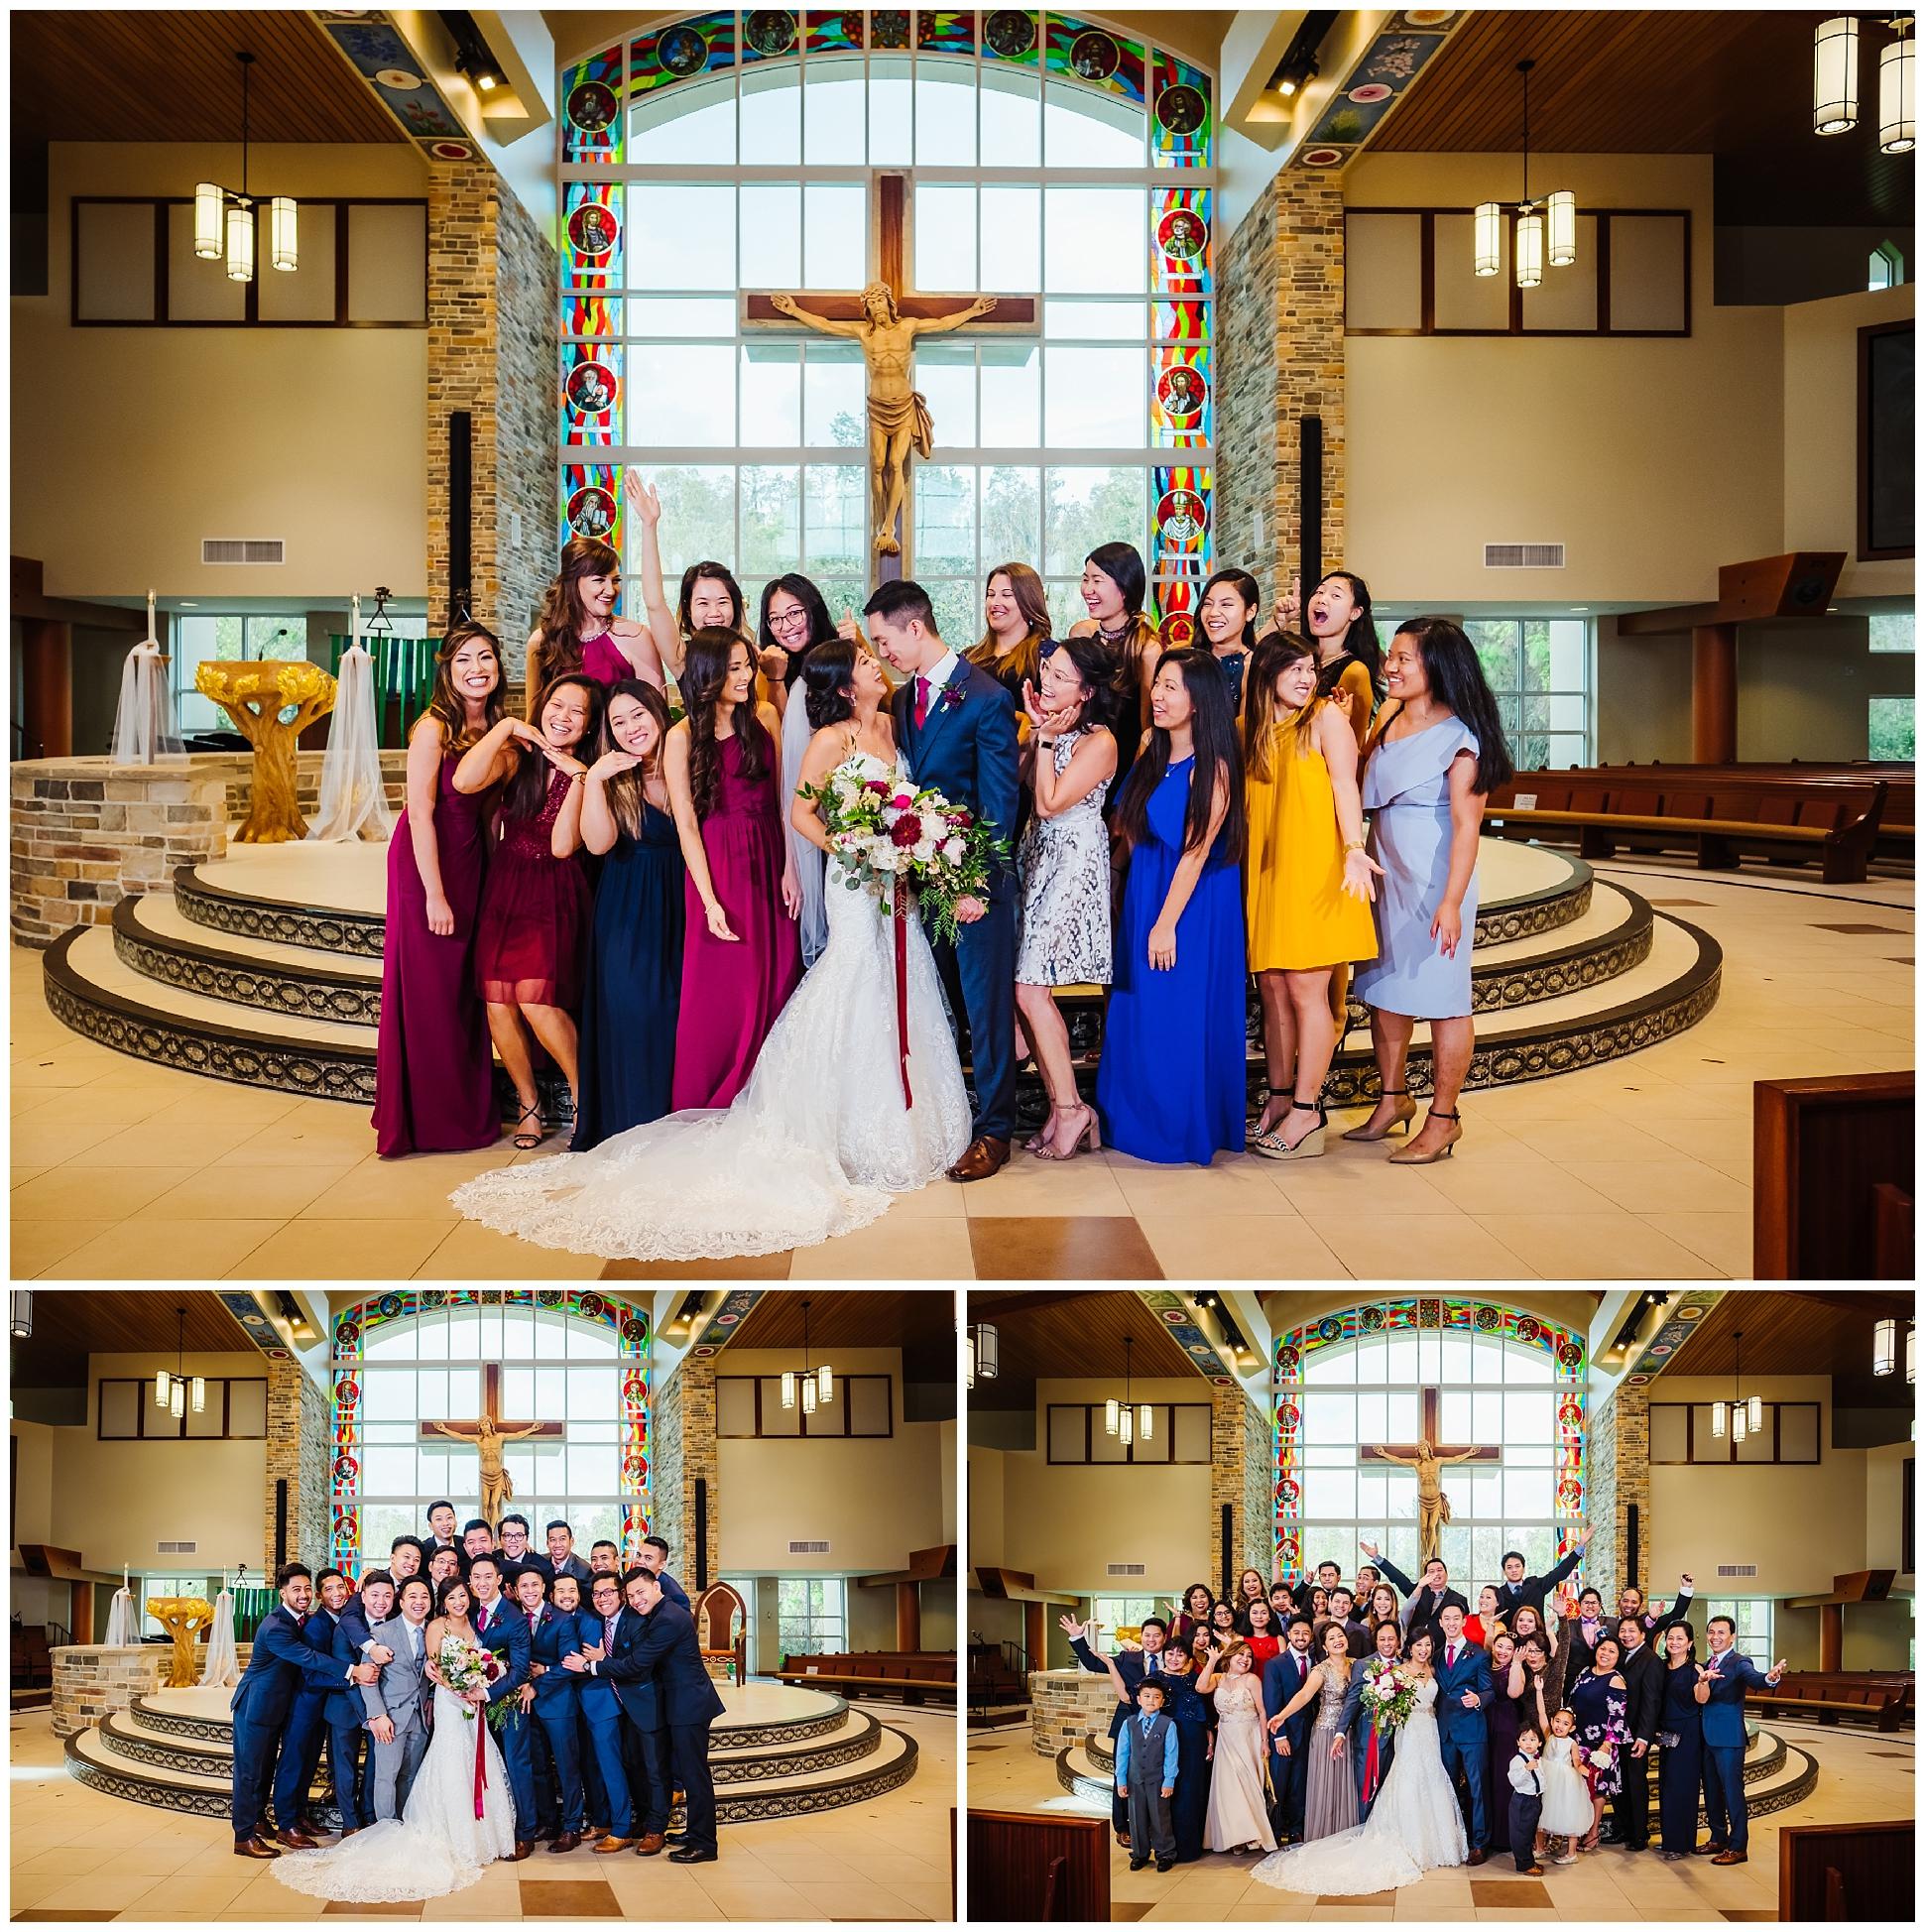 tampa-wedding-photographer-philipino-colorful-woods-ballroom-church-mass-confetti-fuscia_0042.jpg